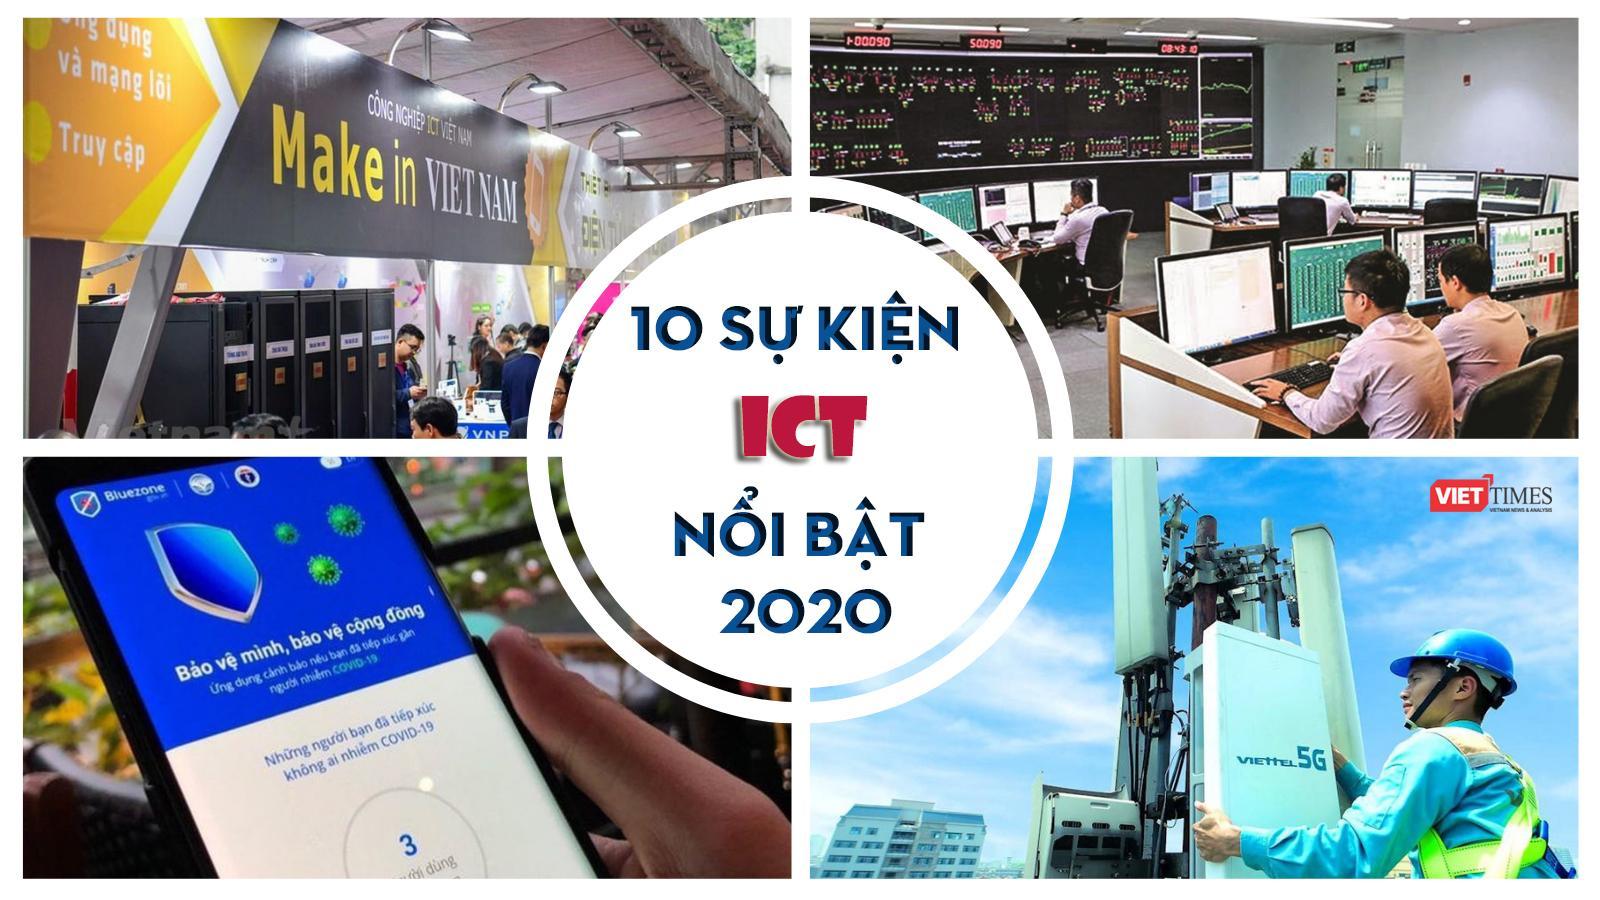 10 sự kiện ICT